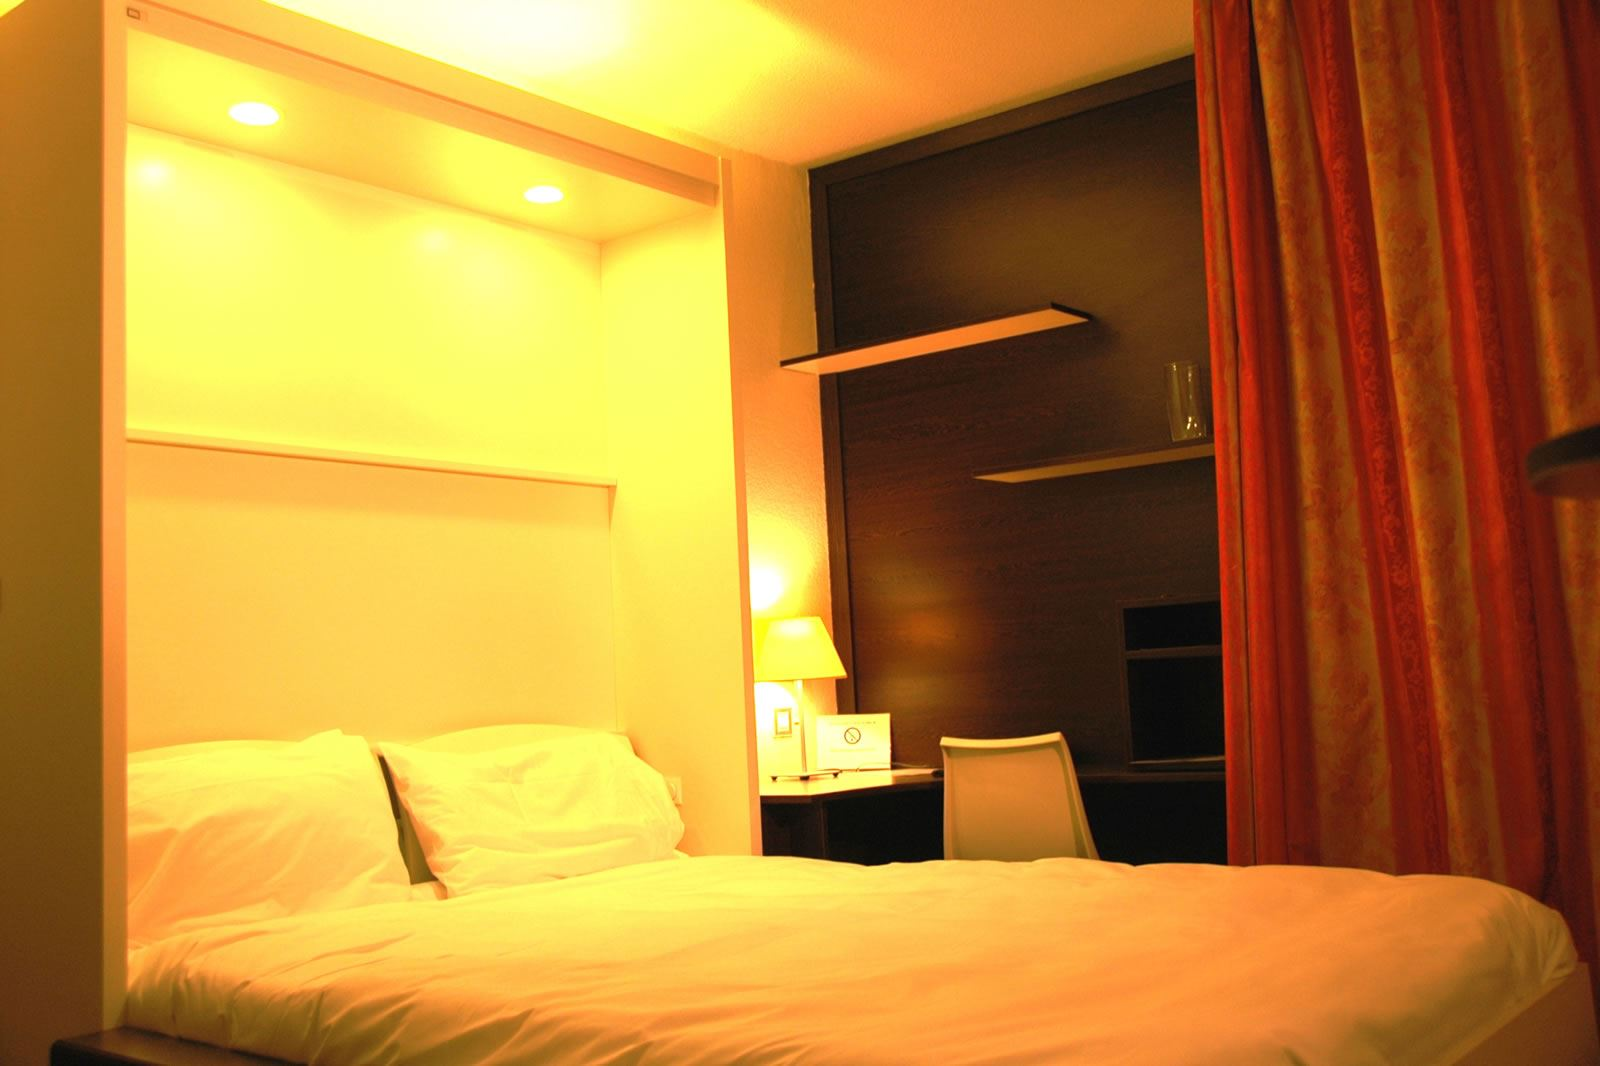 At Home Appart-Hôtel